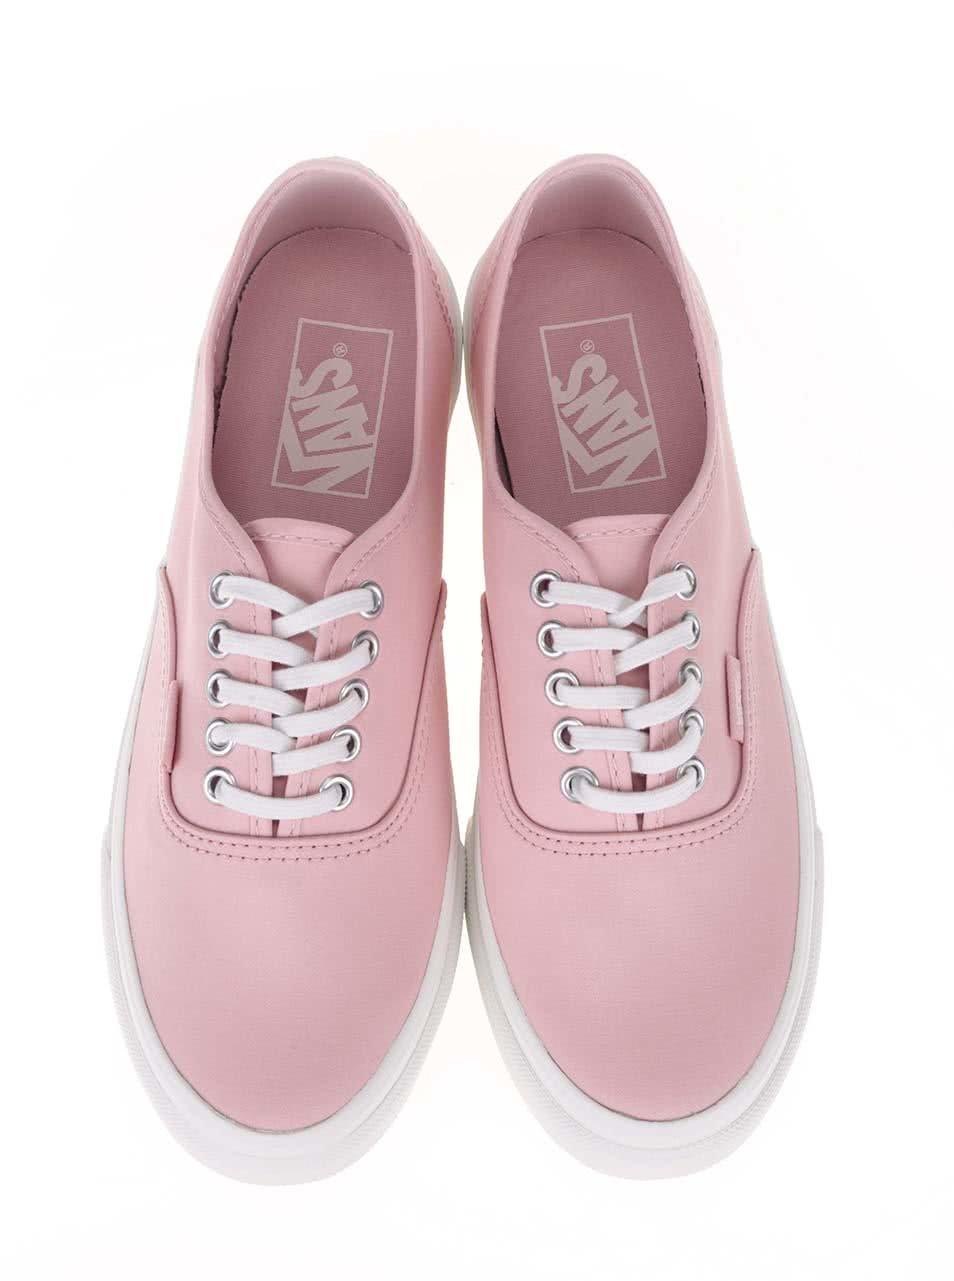 Růžové dámské tenisky Vans Authentic ... 0473352132